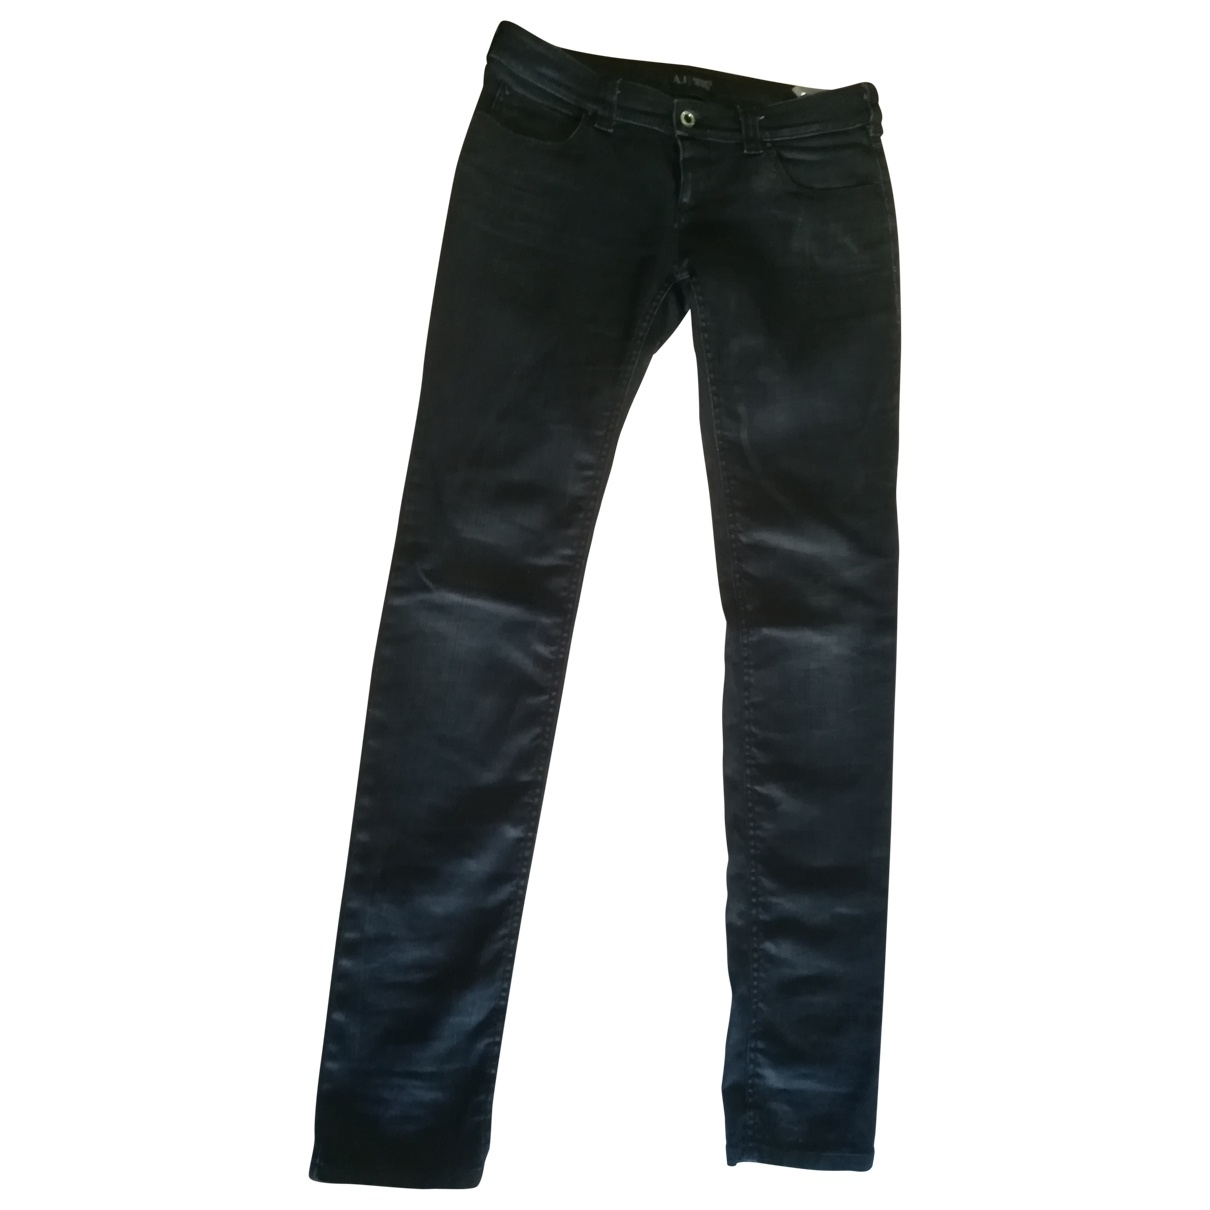 Armani Jeans \N Black Denim - Jeans Jeans for Women 28 US